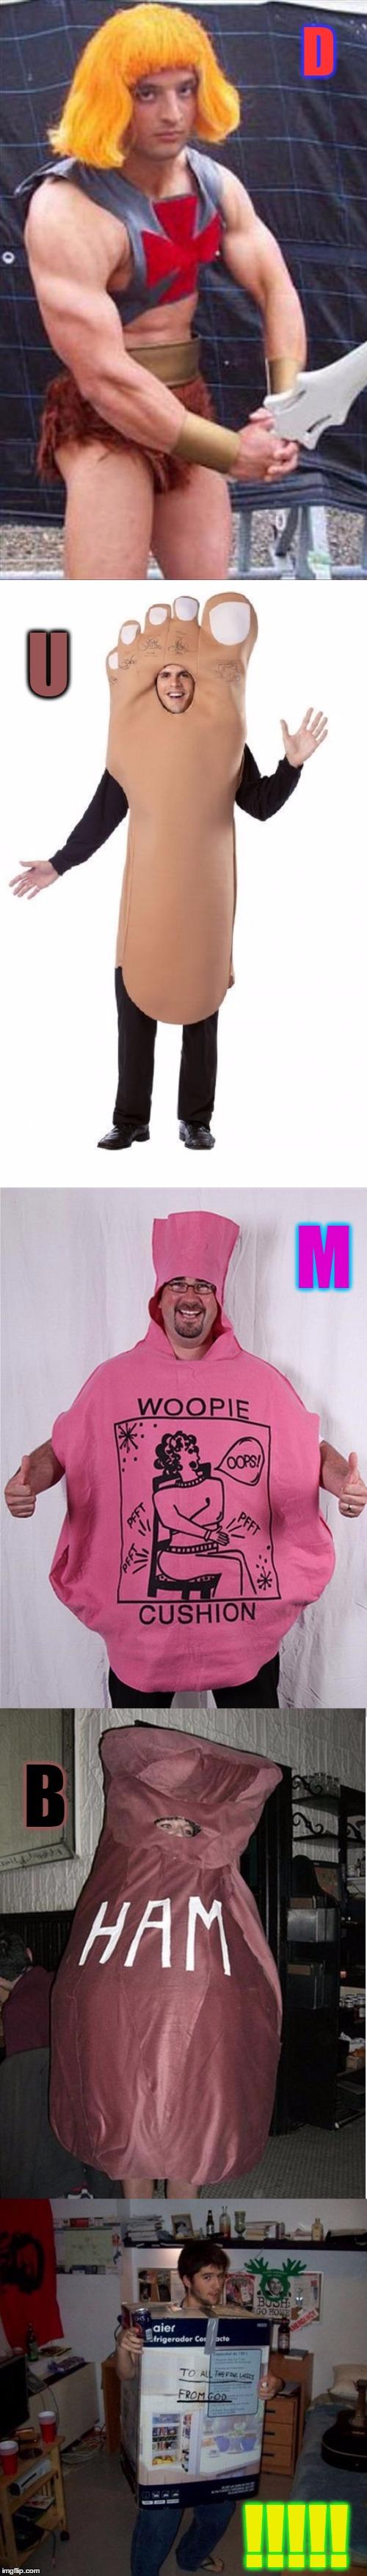 very dumb halloween costumes - imgflip